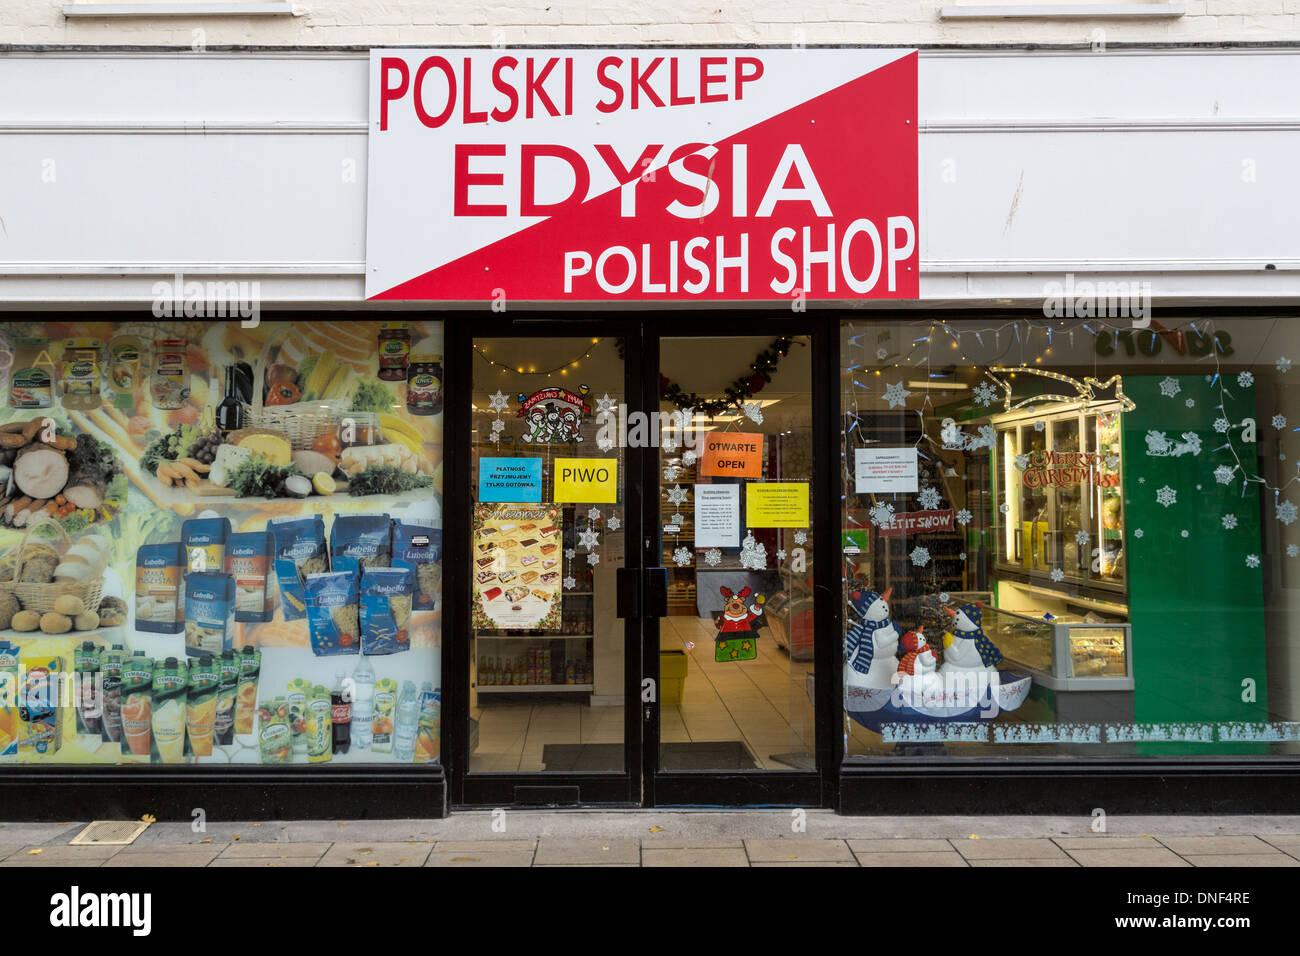 e9e5d8717cc69 Polish shop in shopping centre, Hereford, England, UK Stock Photo ...